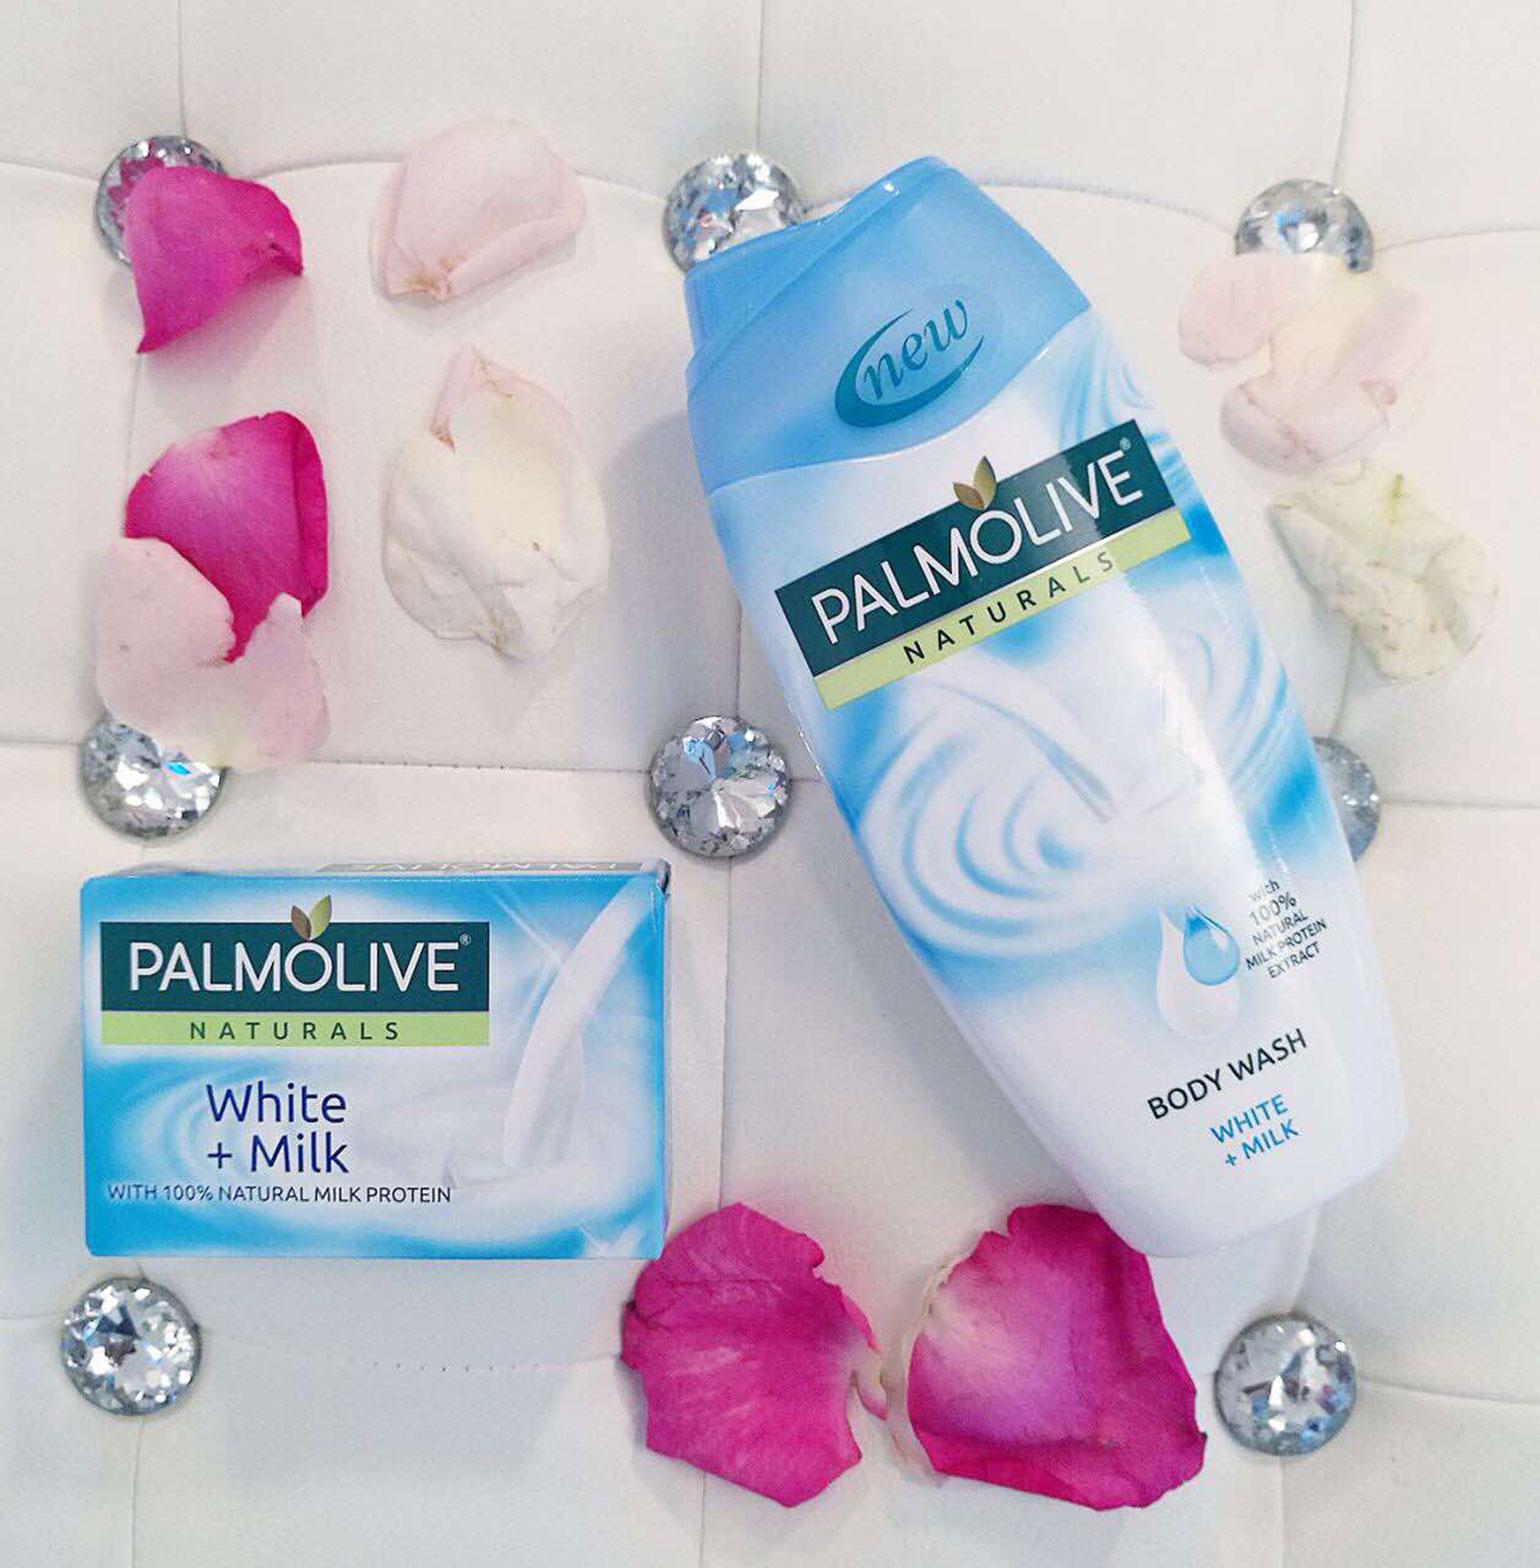 10.1 Palmolive Naturals White plus Milk